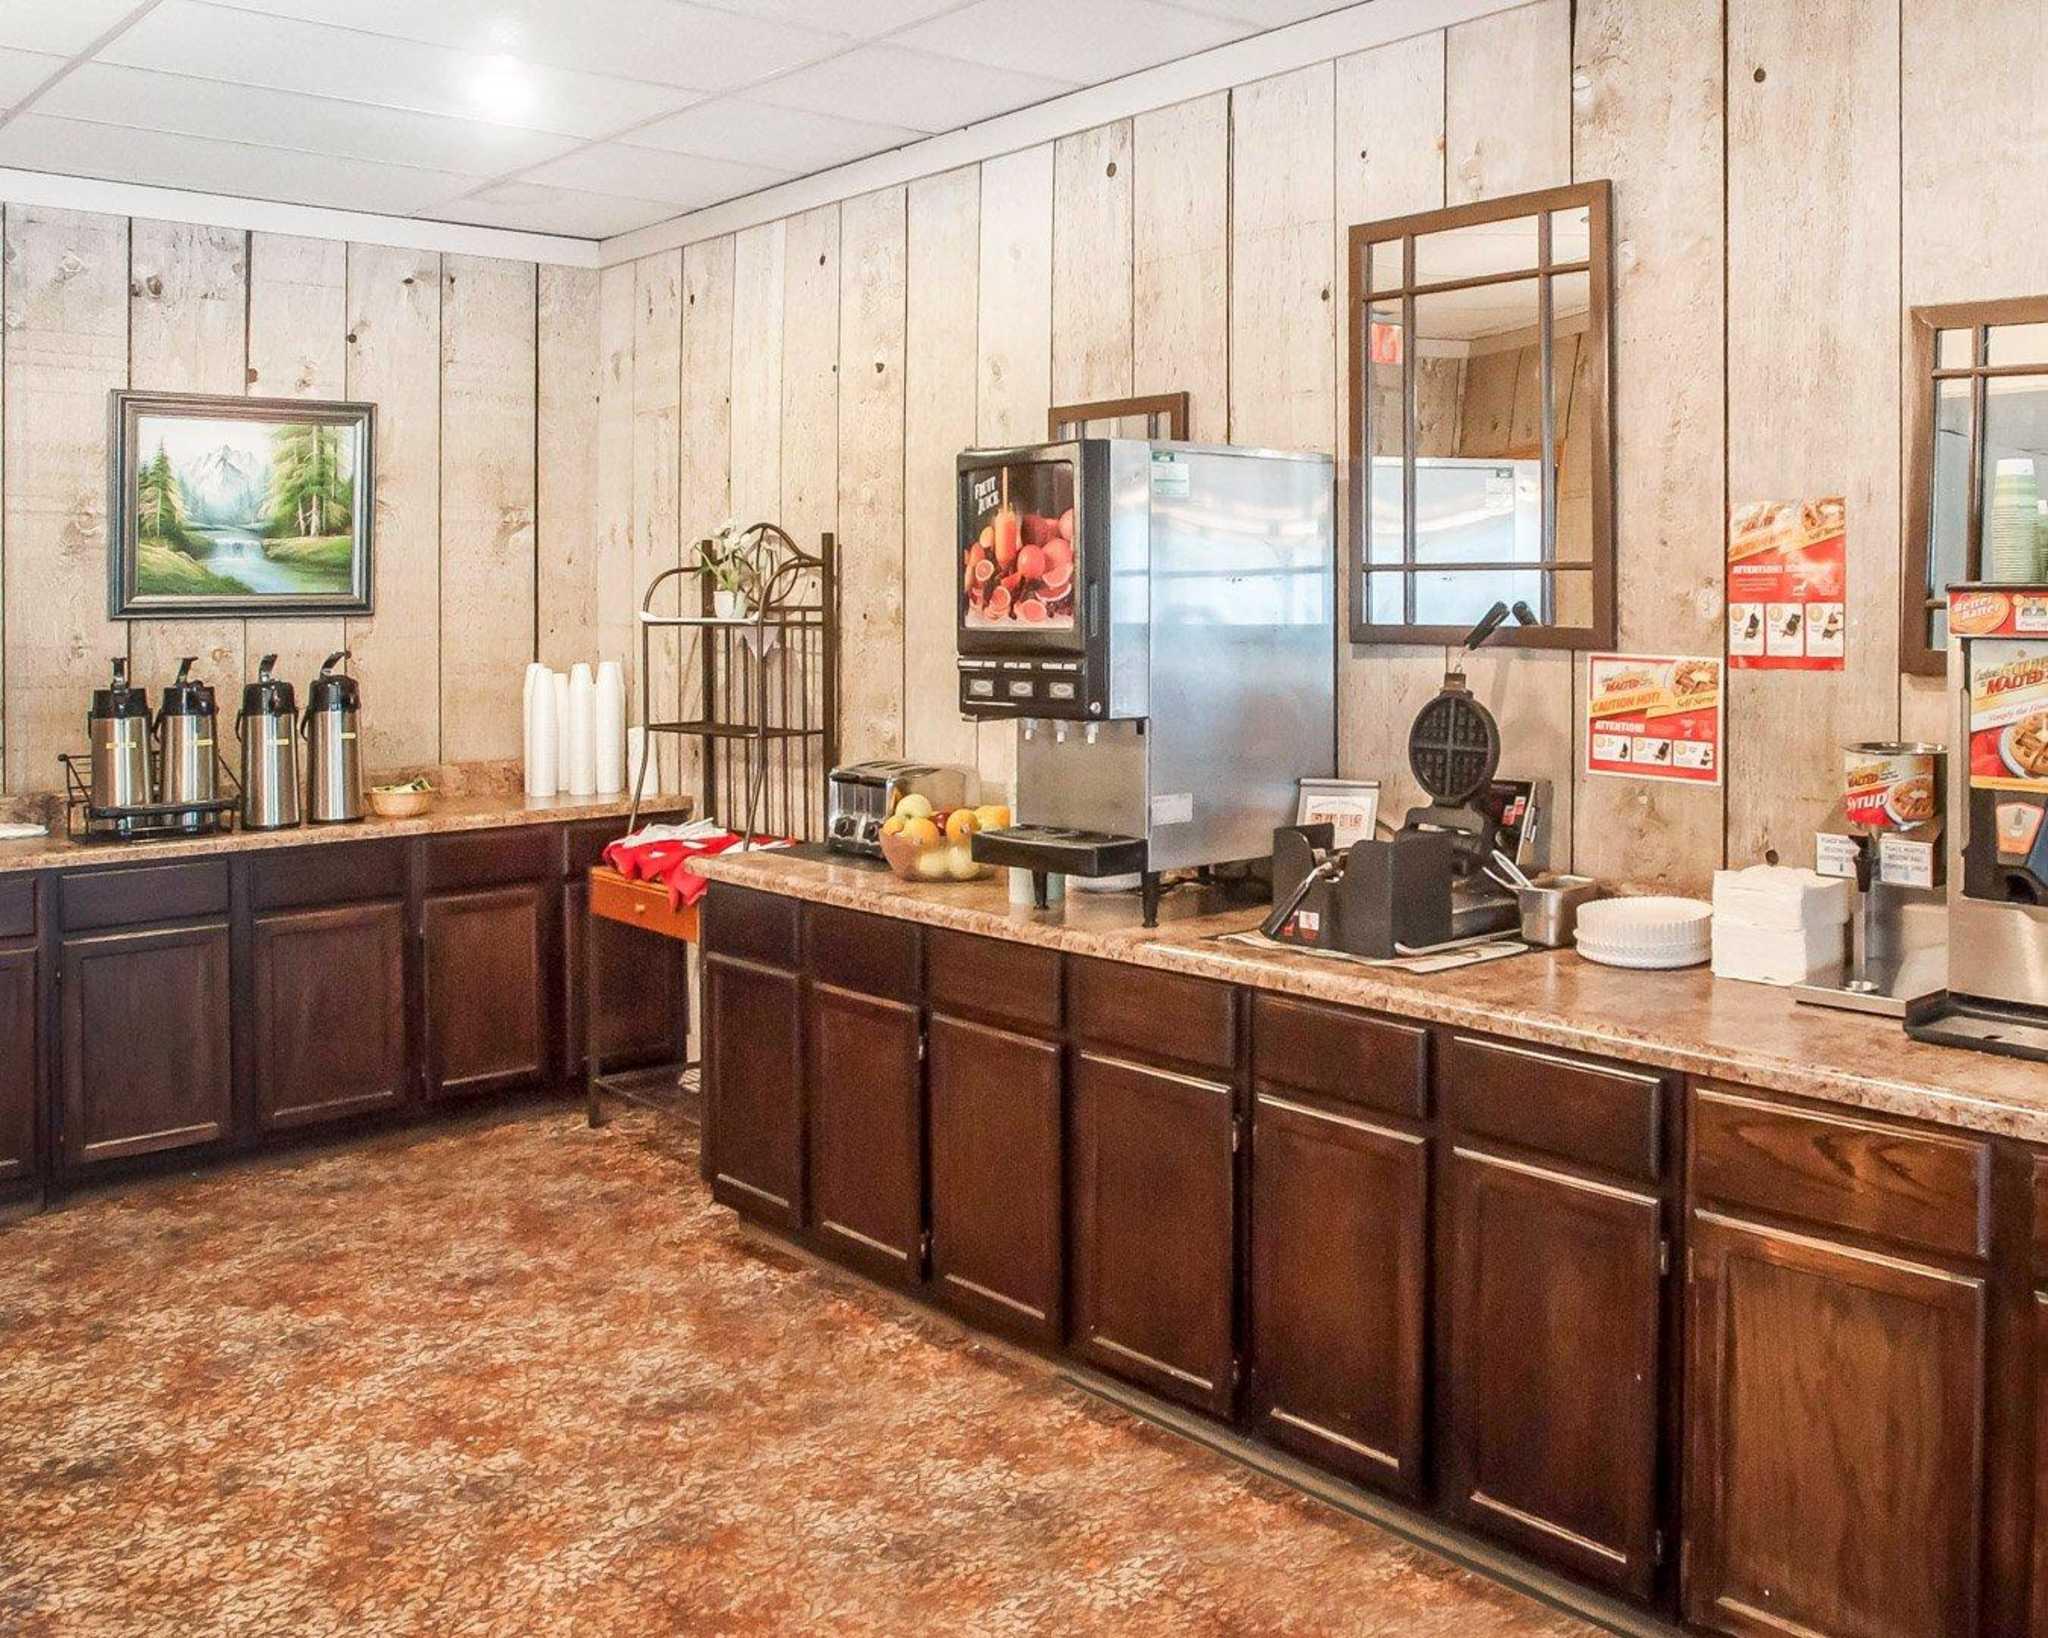 Rodeway Inn in Estes Park, CO, photo #20